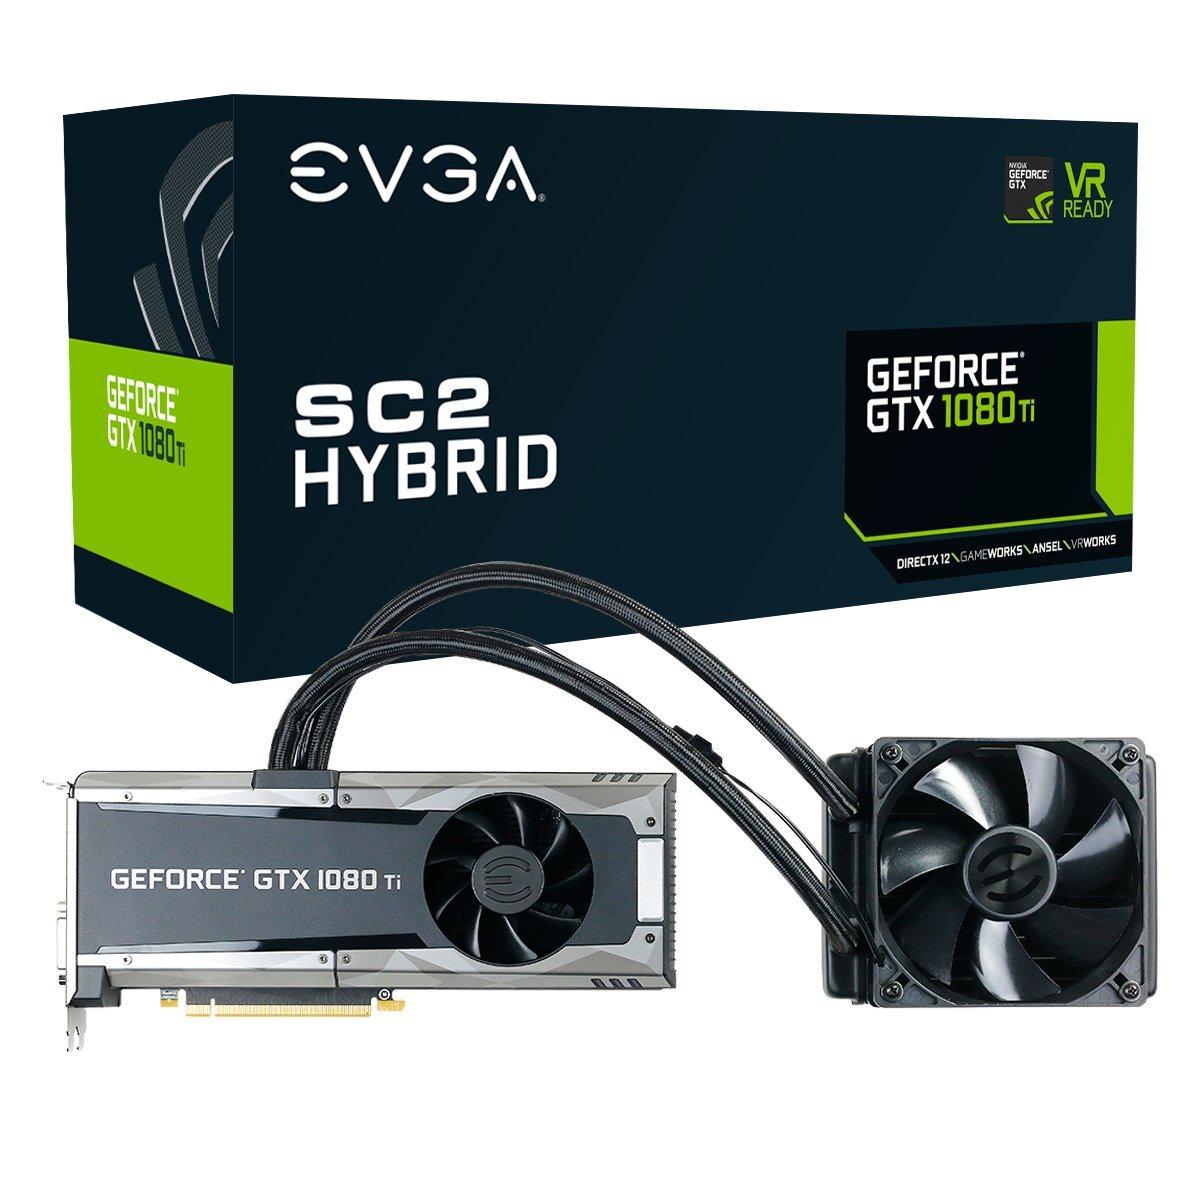 EVGA GeForce GTX 1080 Ti SC2 Hybrid Gaming, 11GB GDDR5X, iCX Technology - 9 Thermal Sensors Graphics Card 11G-P4-6598-KR (Renewed)